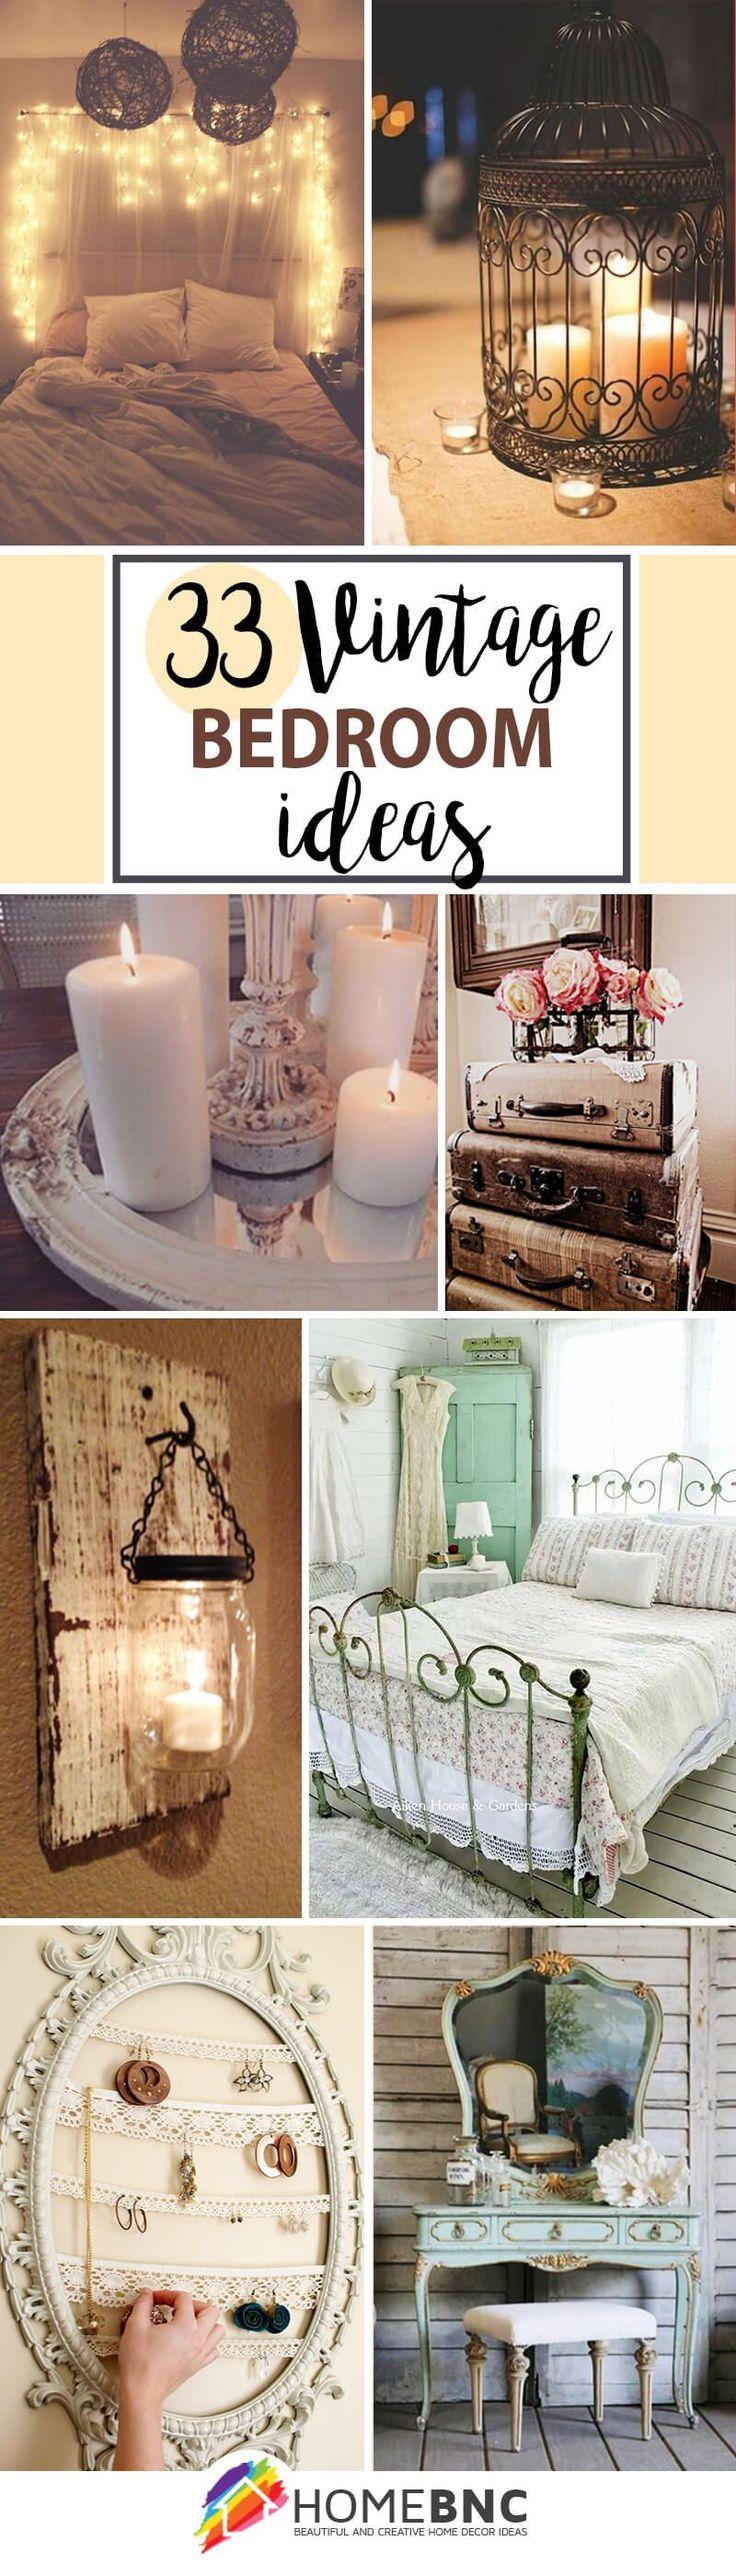 Romantic rustic bedroom ideas shabby chic bedroom design; 33 Vintage Bedroom Decor Ideas To Turn Your Room Into A Paradise Vintage Bedroom Decor Bedroom Vintage Home Decor Bedroom